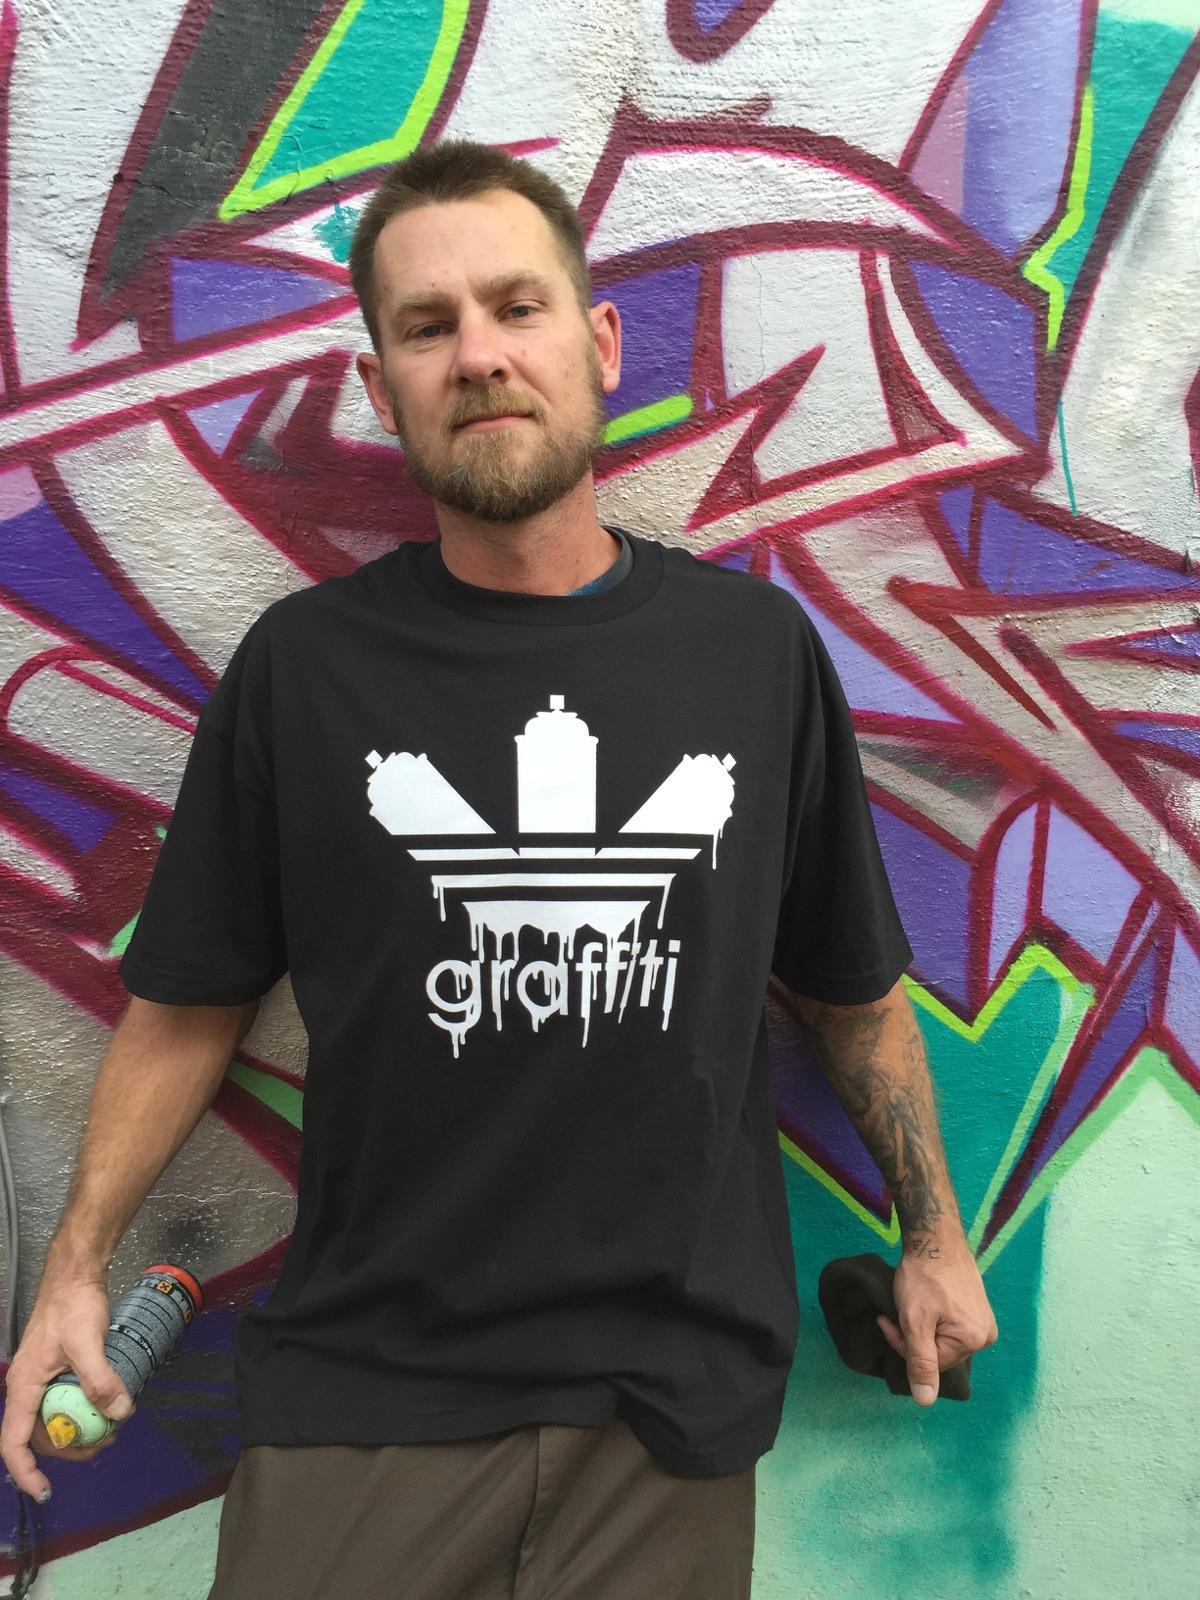 Graffiti Tshirt Custom Graphic Design T Shirt Cotton Emer Black